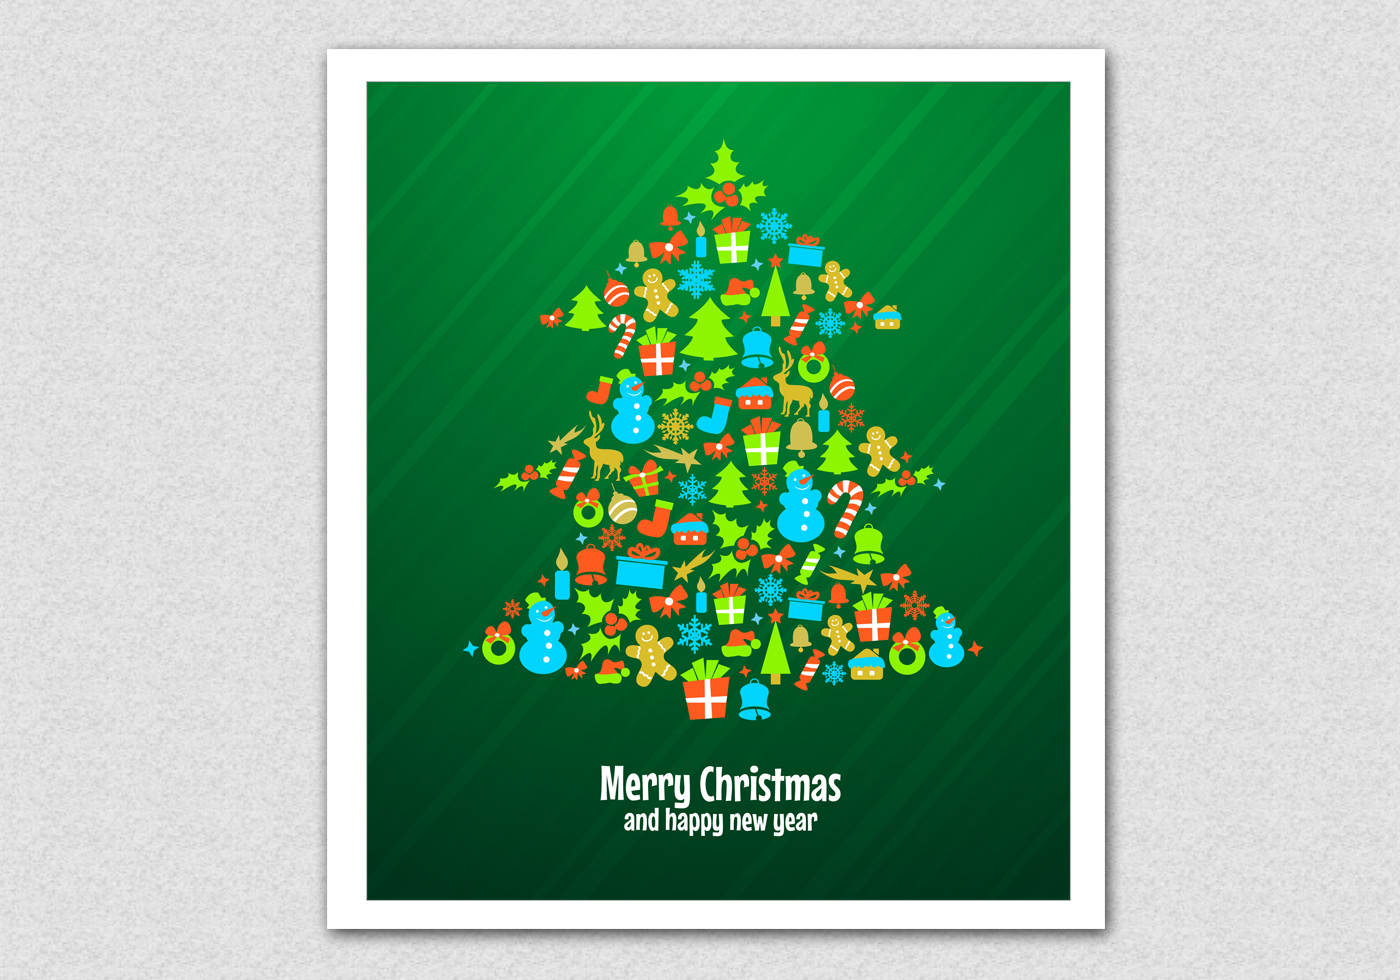 Green Christmas Tree Psd Background Free Photoshop Brushes At Brusheezy